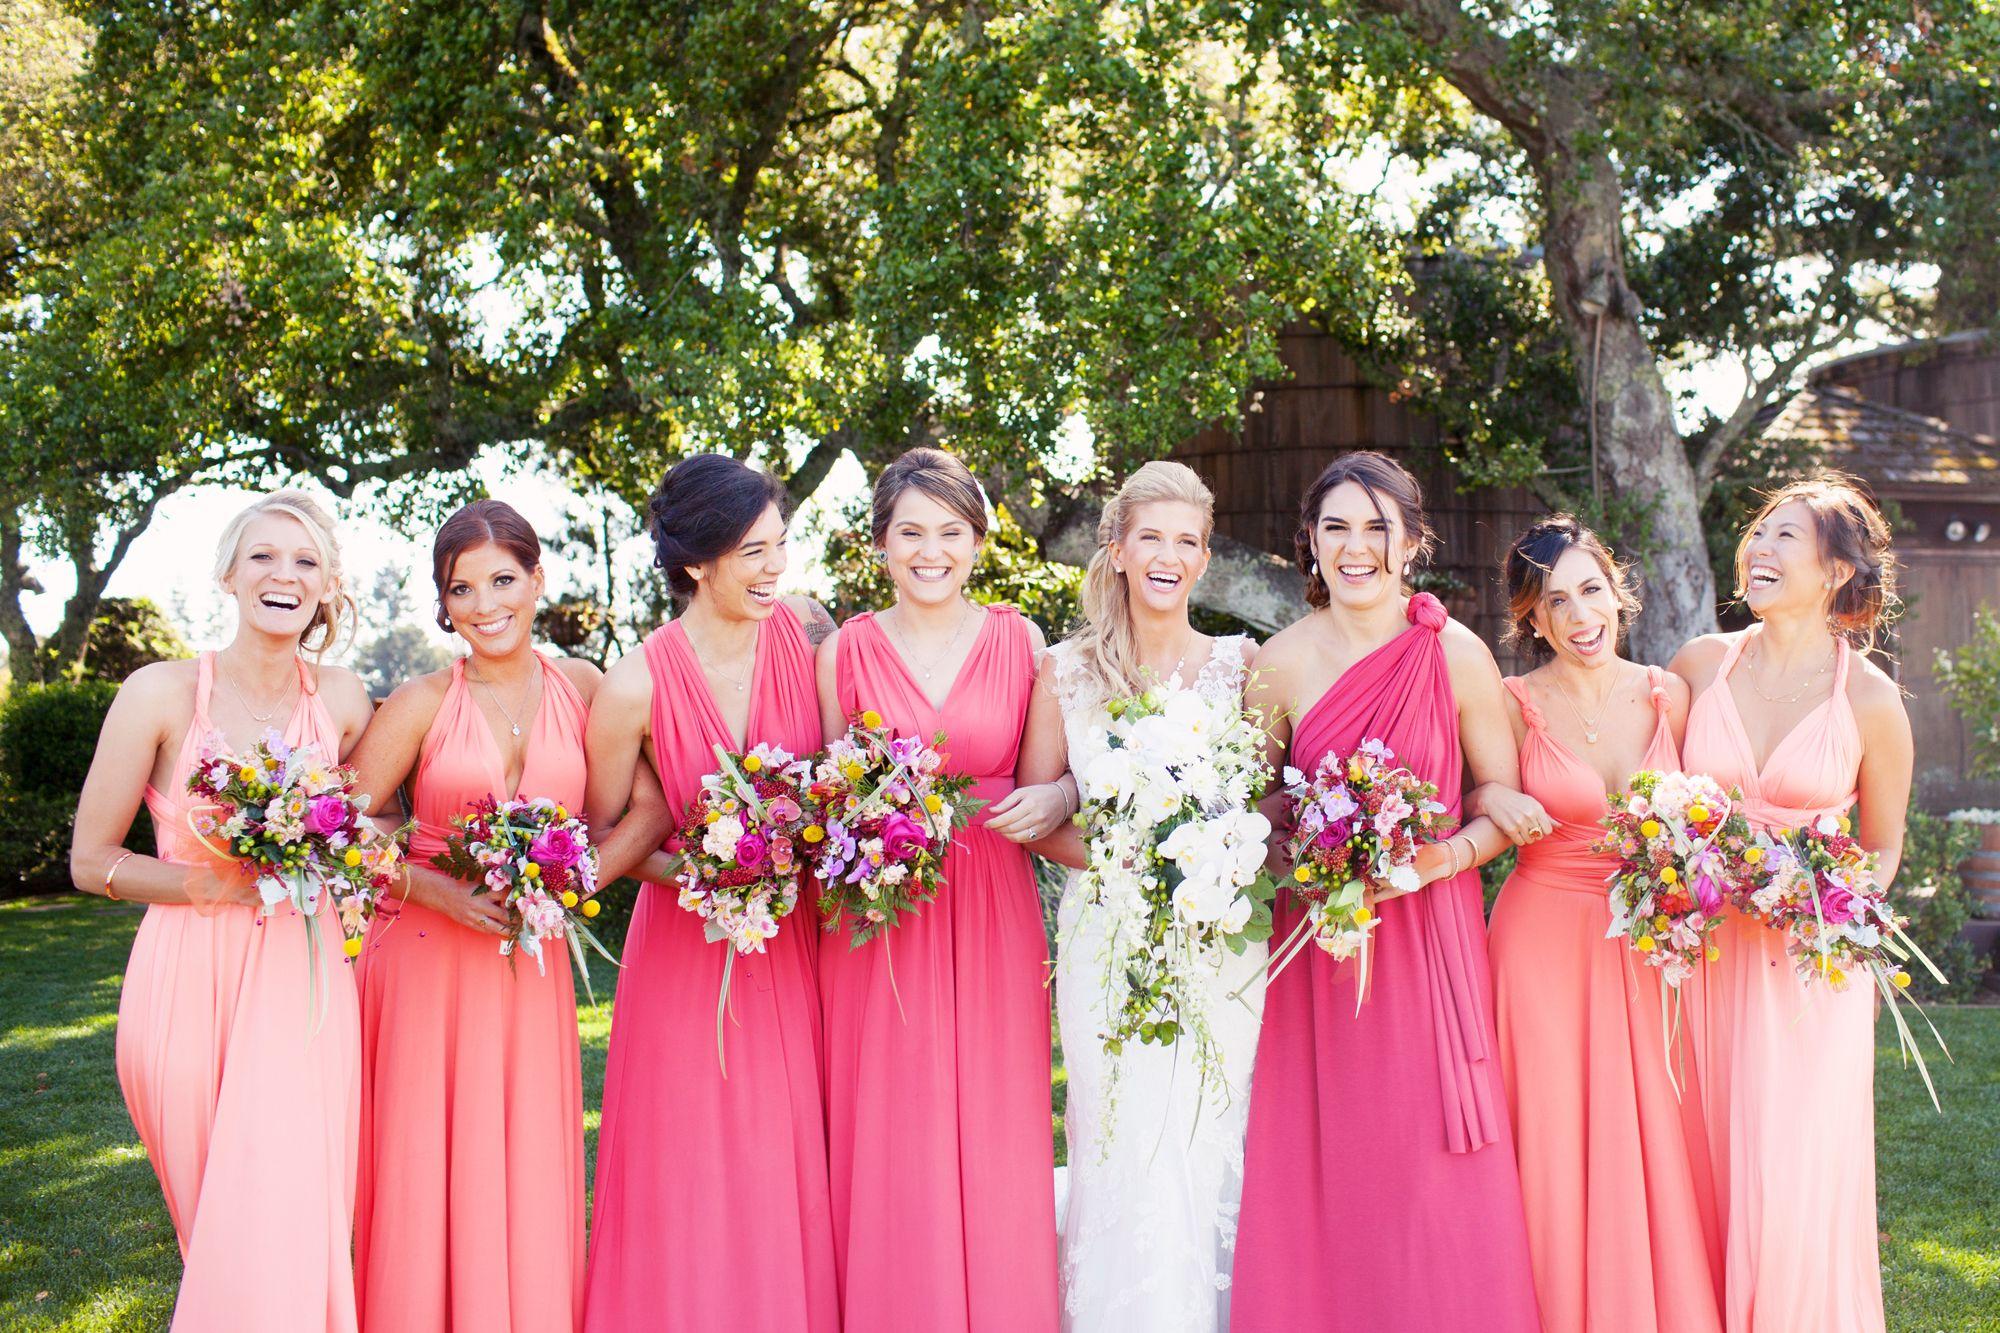 The Smarter Way to Wed | Damas y Boda